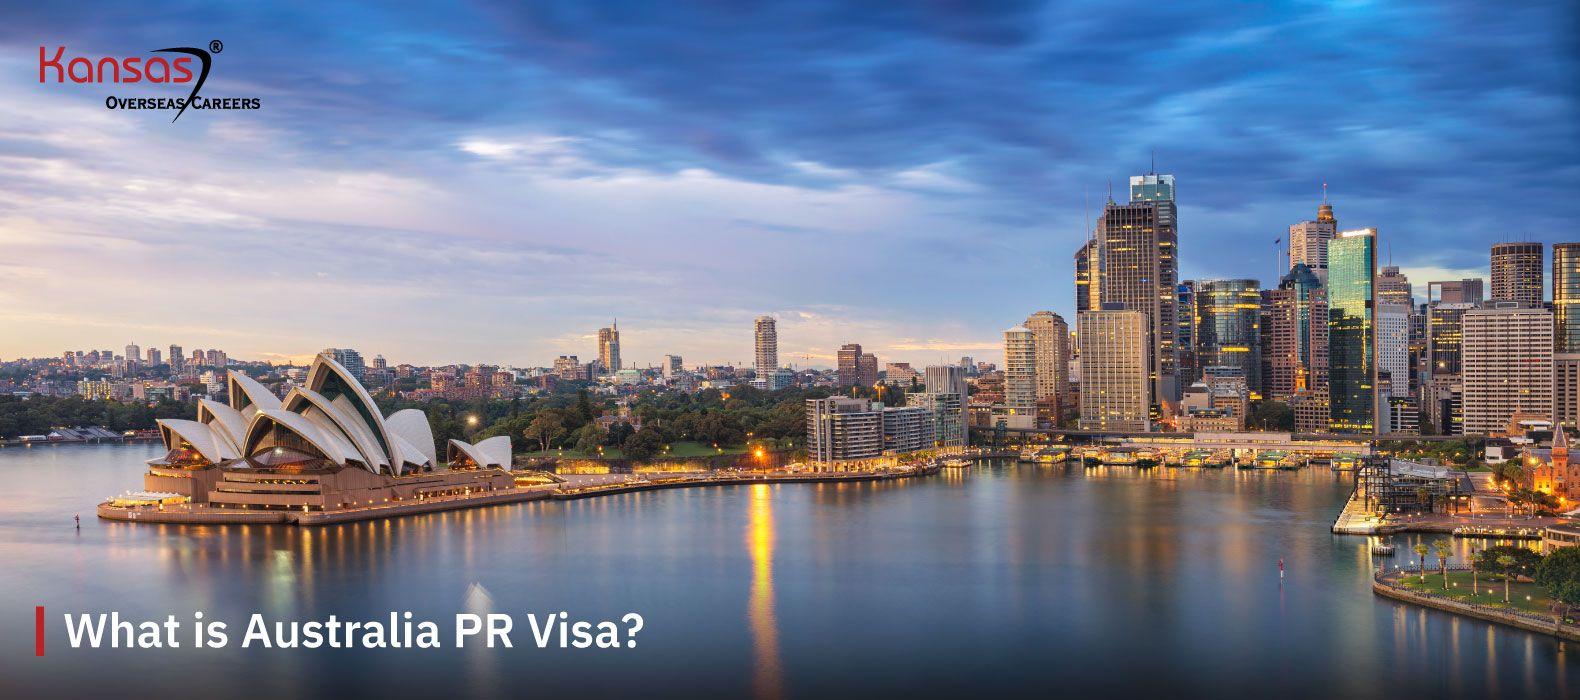 What-is-Australia-PR-Visa-